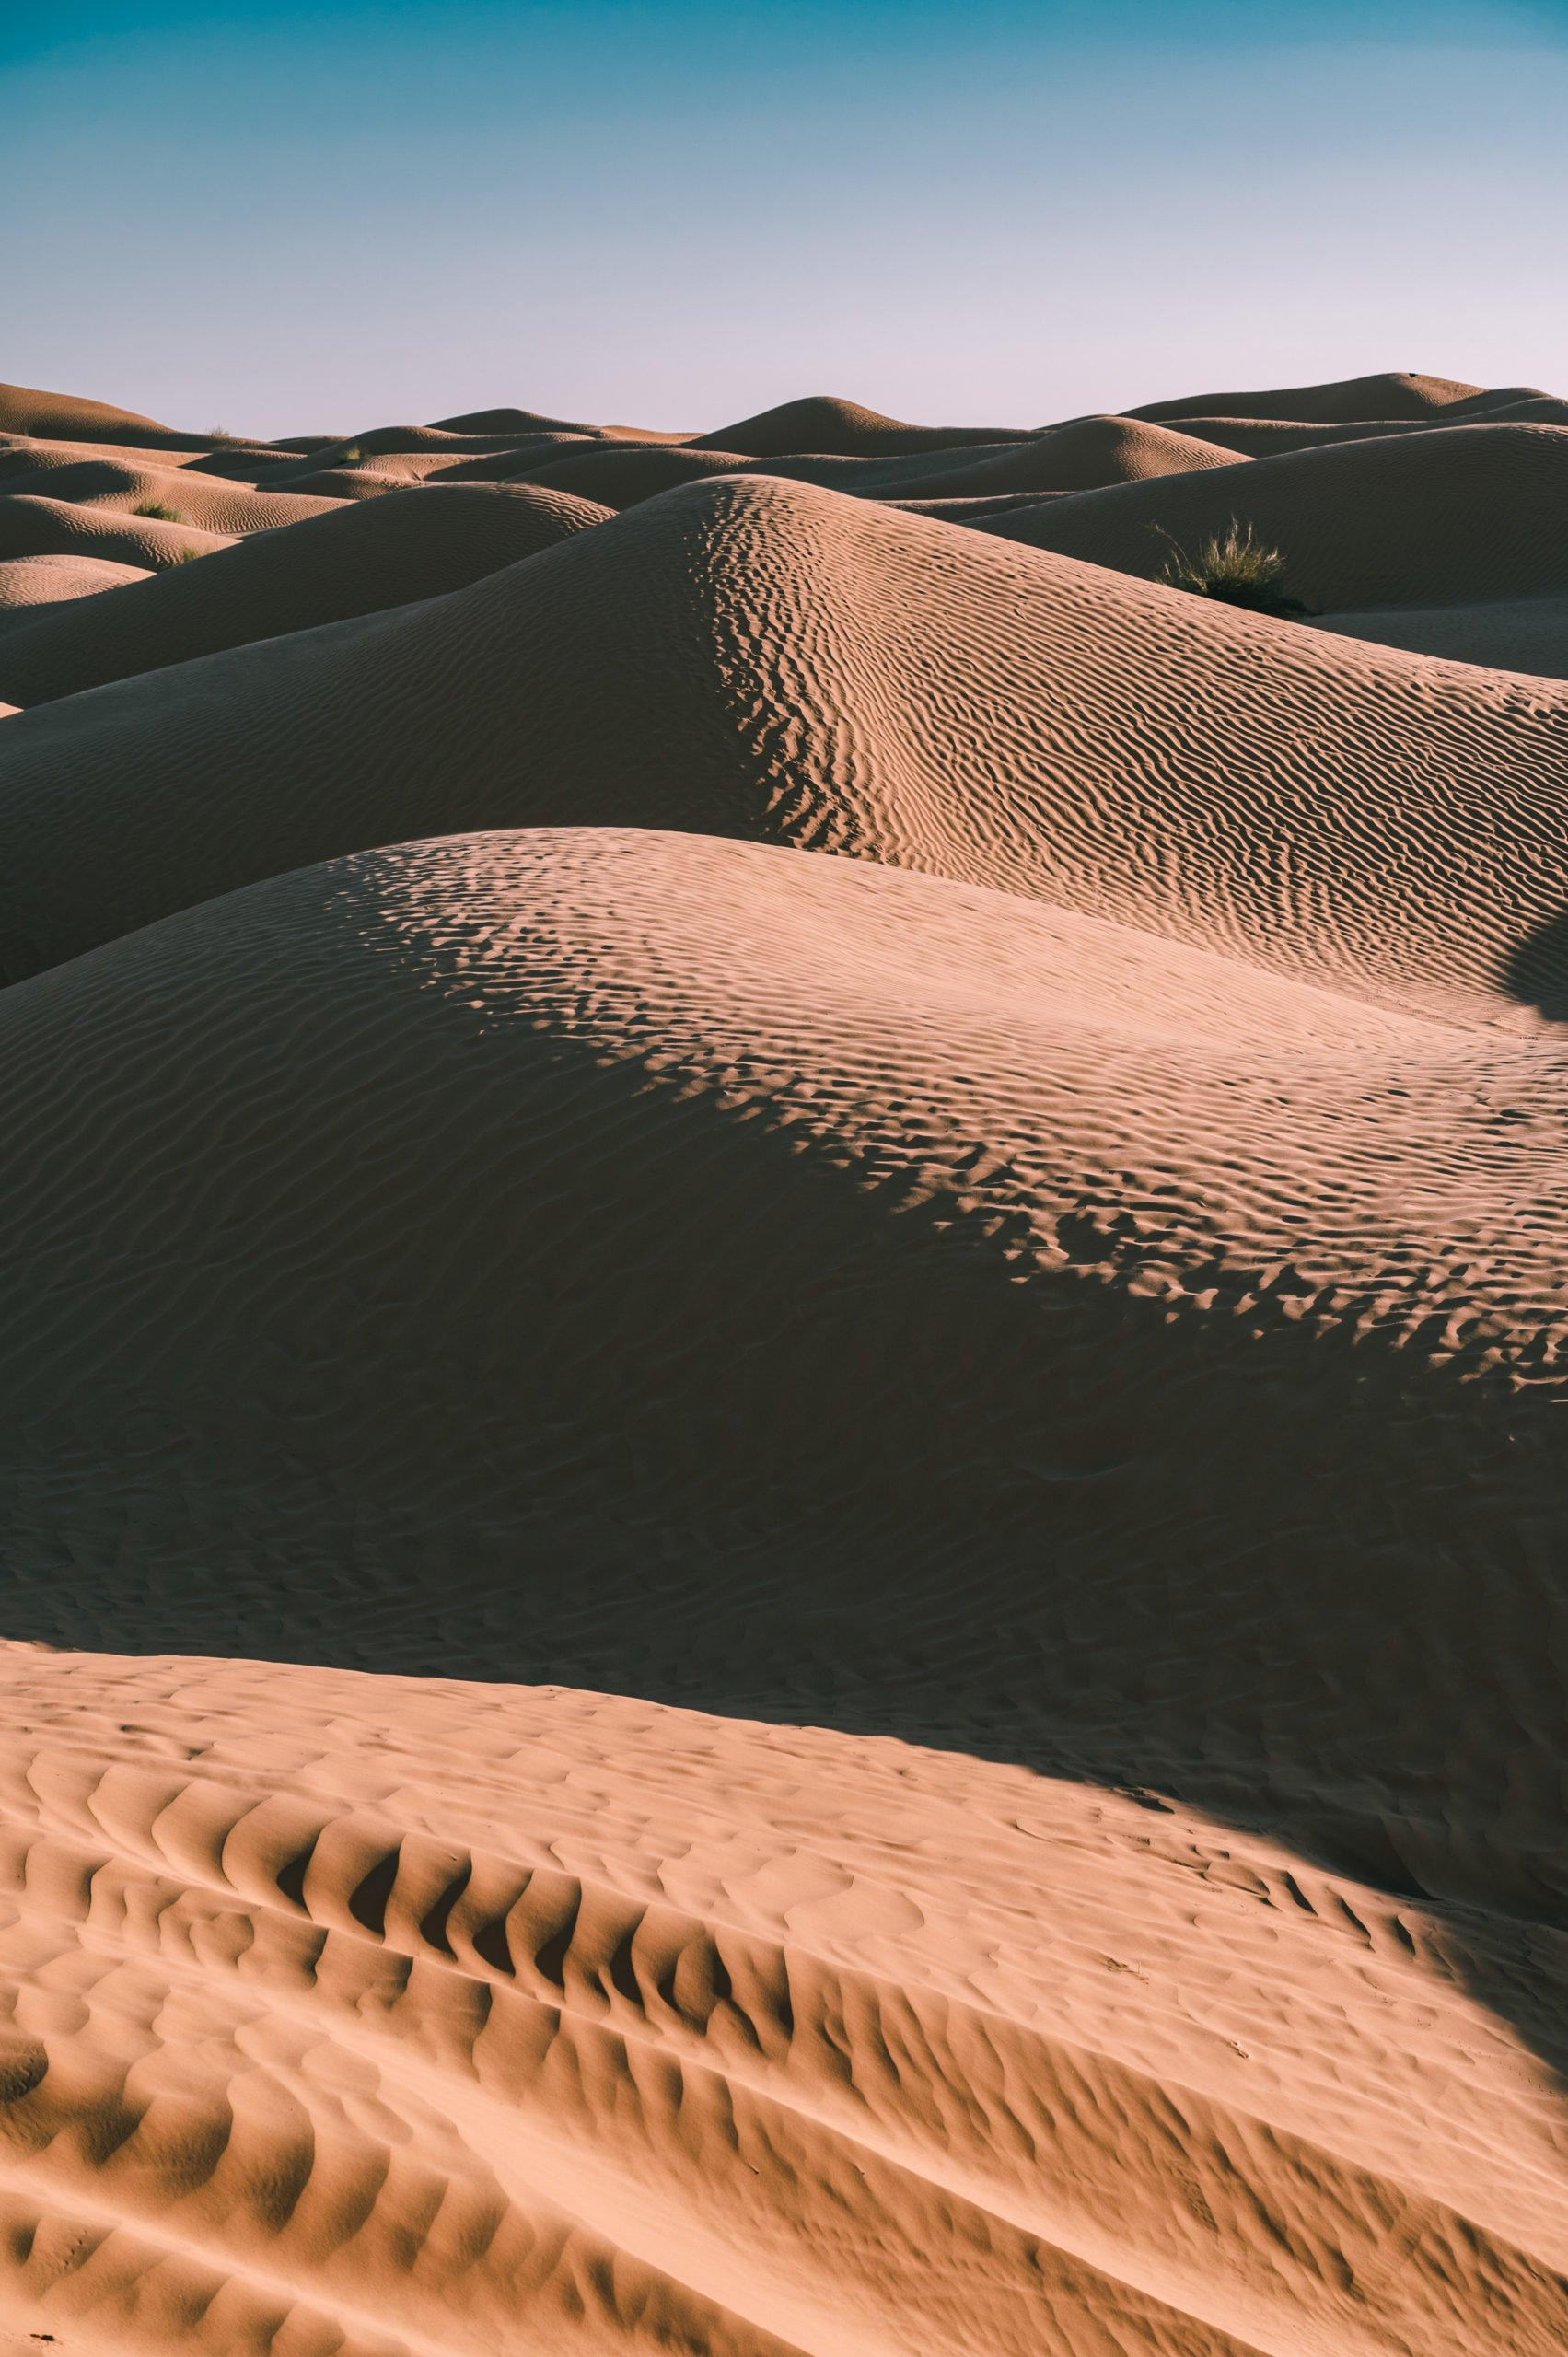 désert tunisie dunes